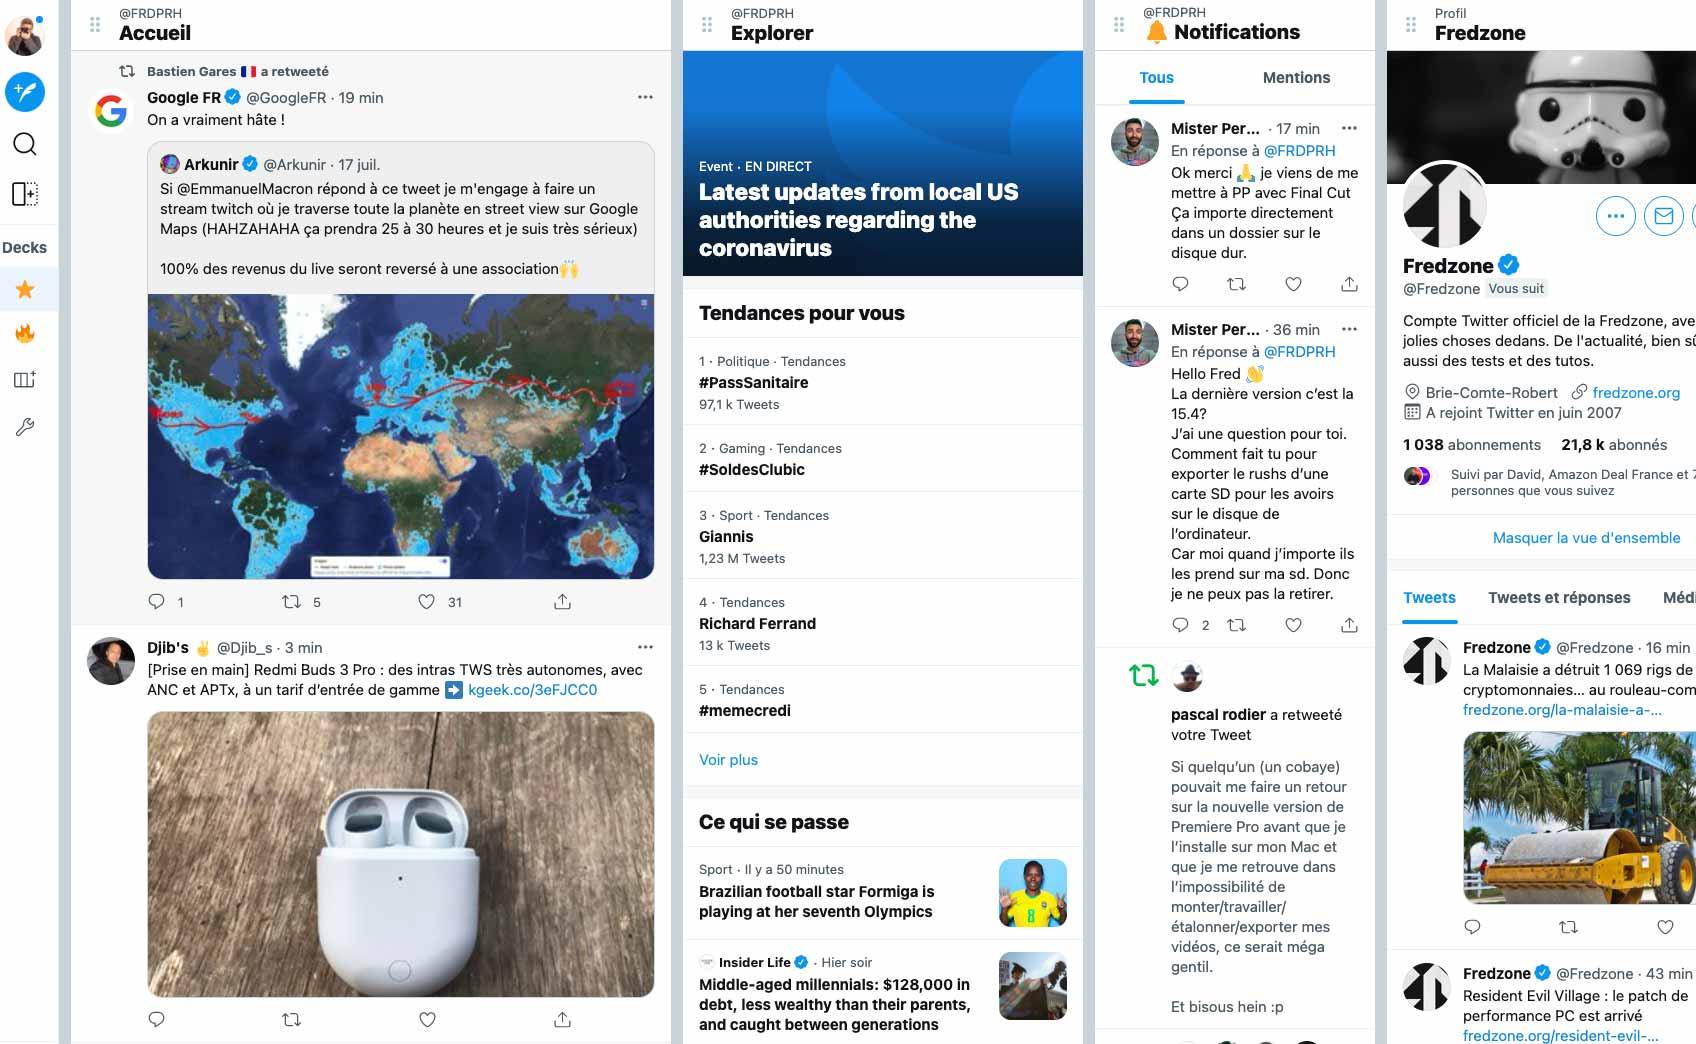 Une capture de la nouvelle version de Tweetdeck, sortie en 2021